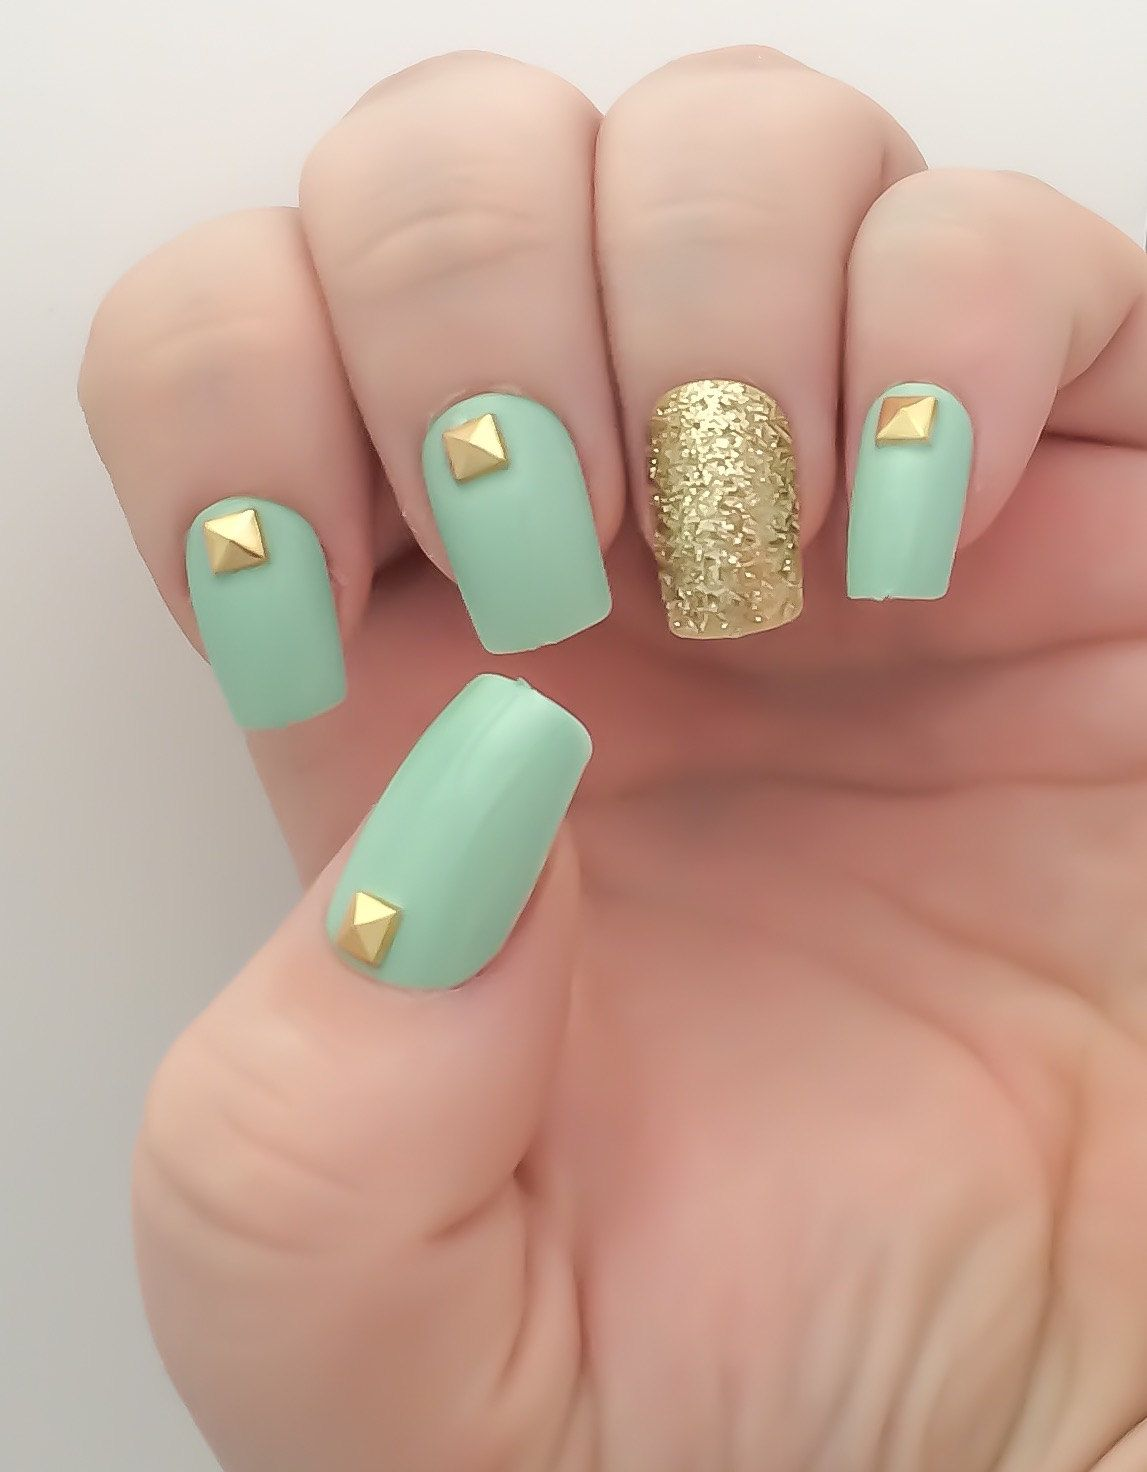 salmon acrylic nail designs instagram - Google Search   hoco nails ...